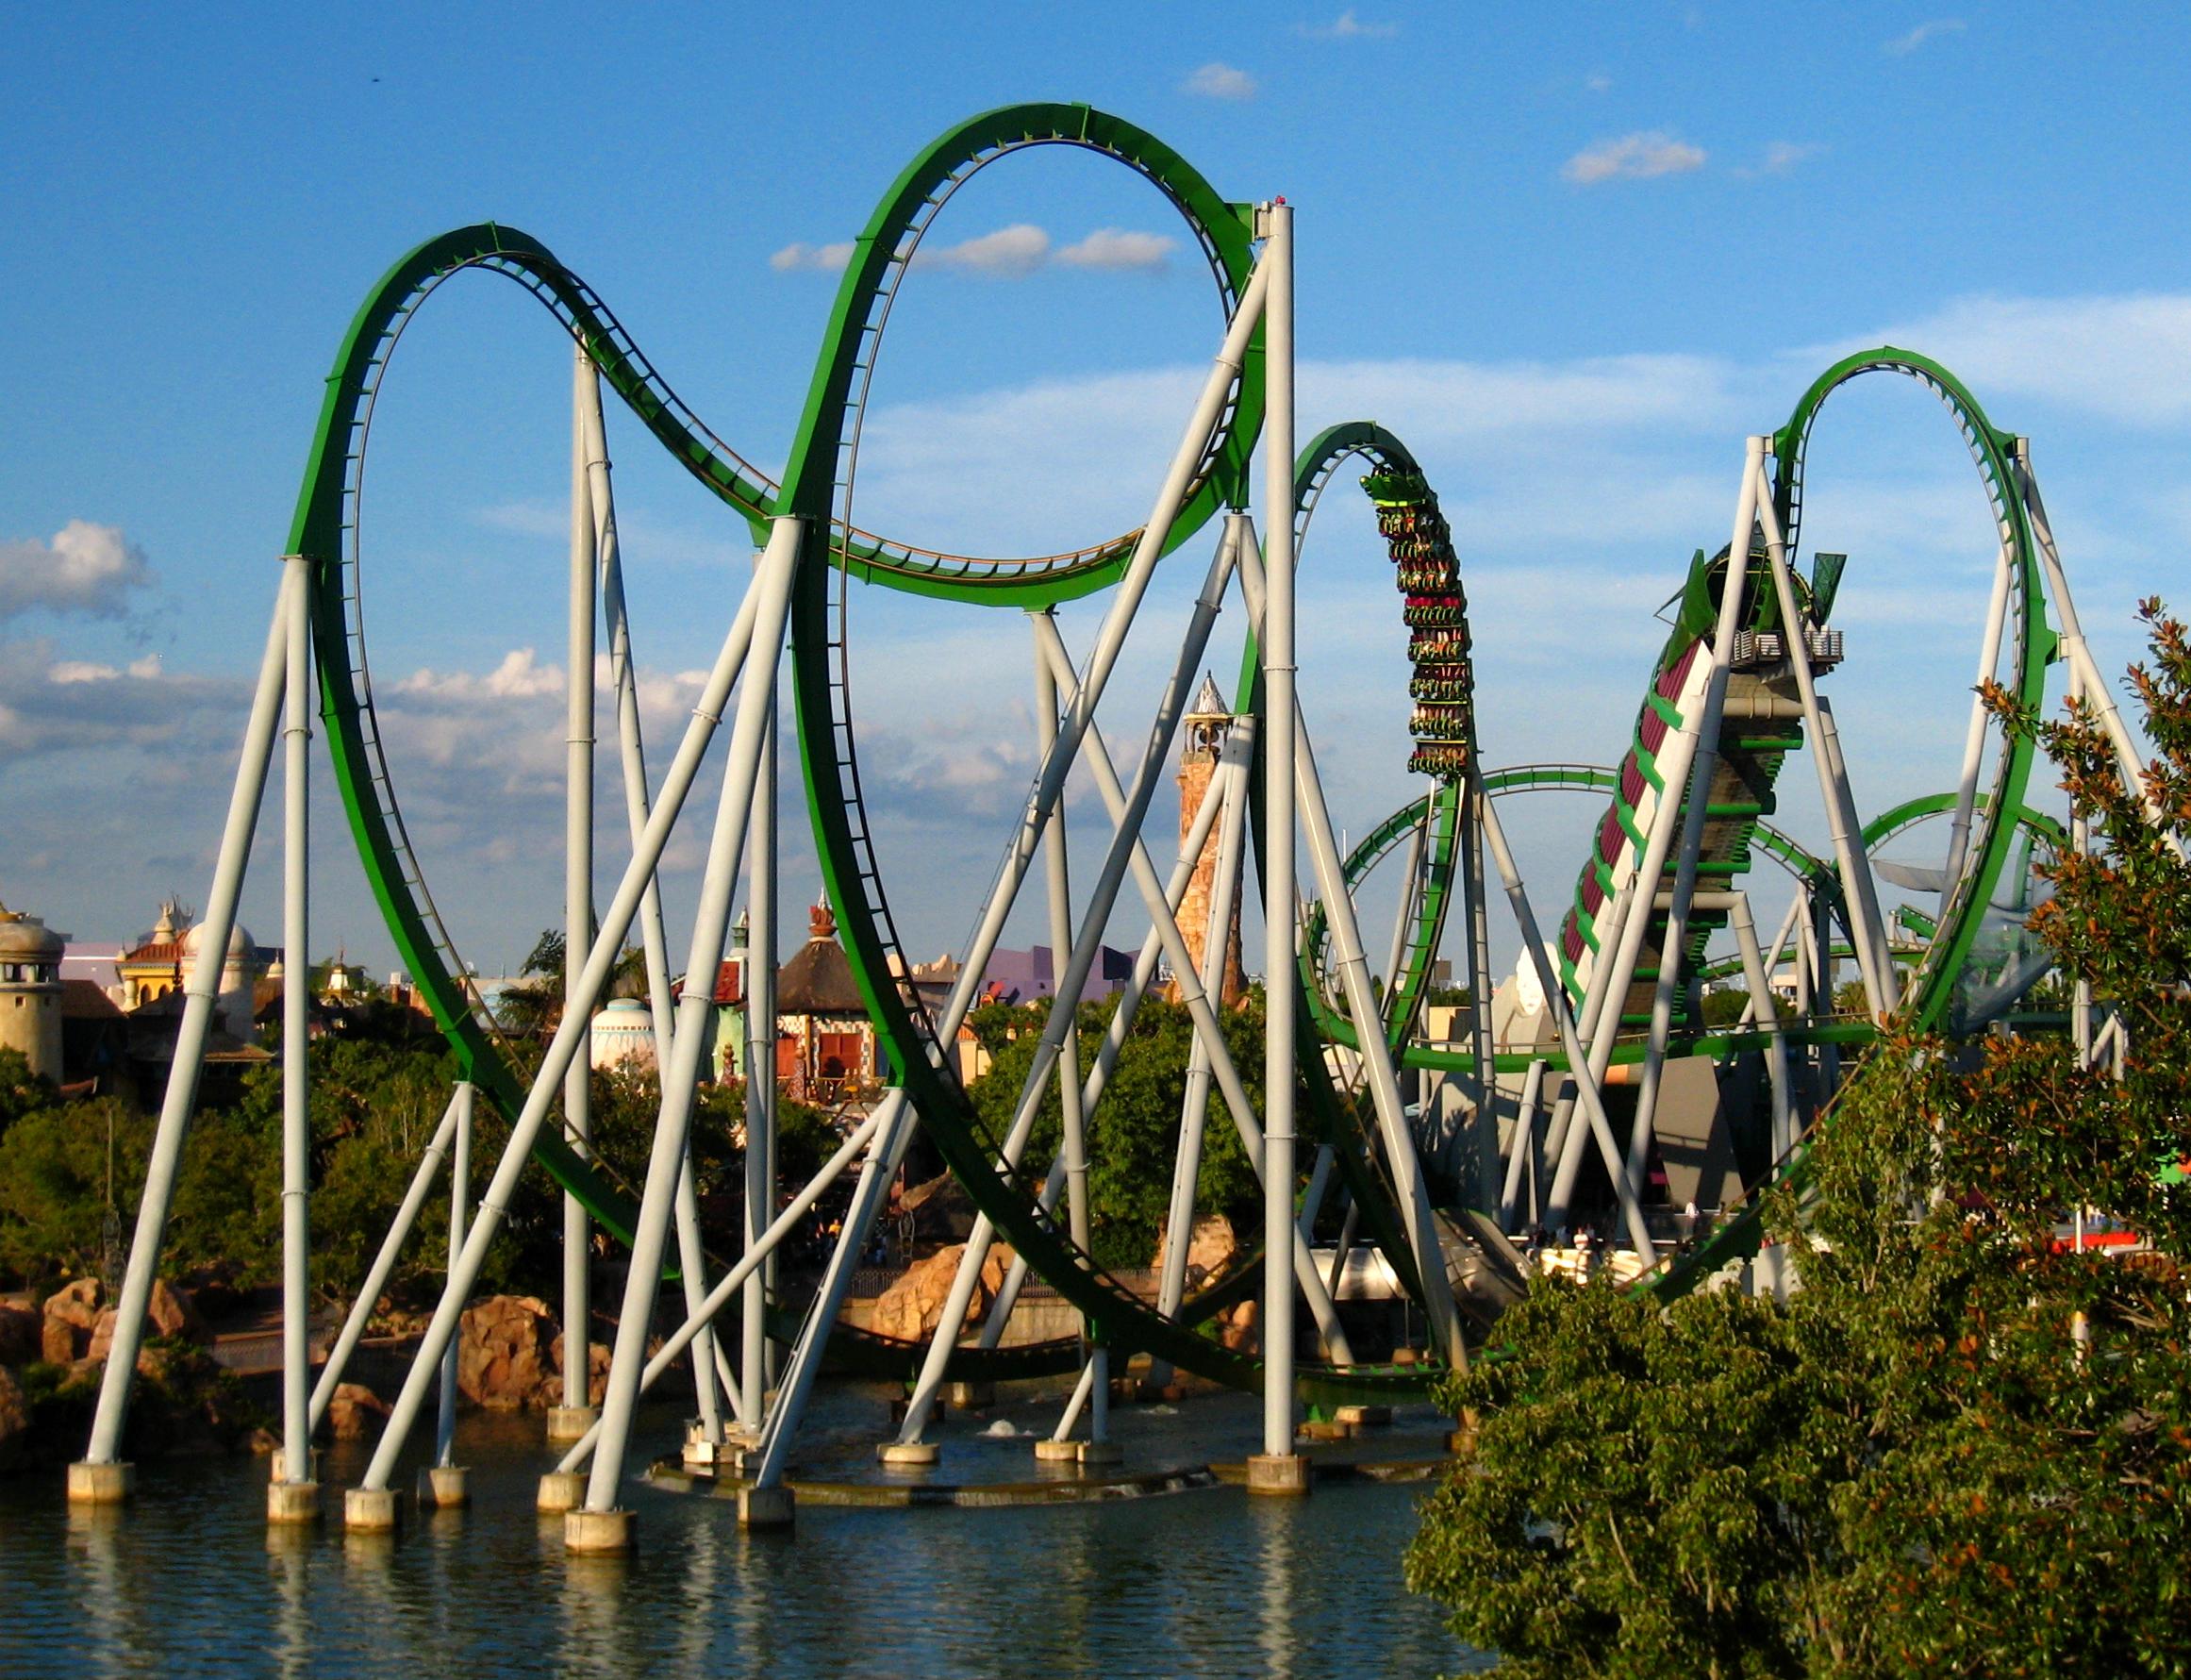 Hulk Rollercoaster Orlando